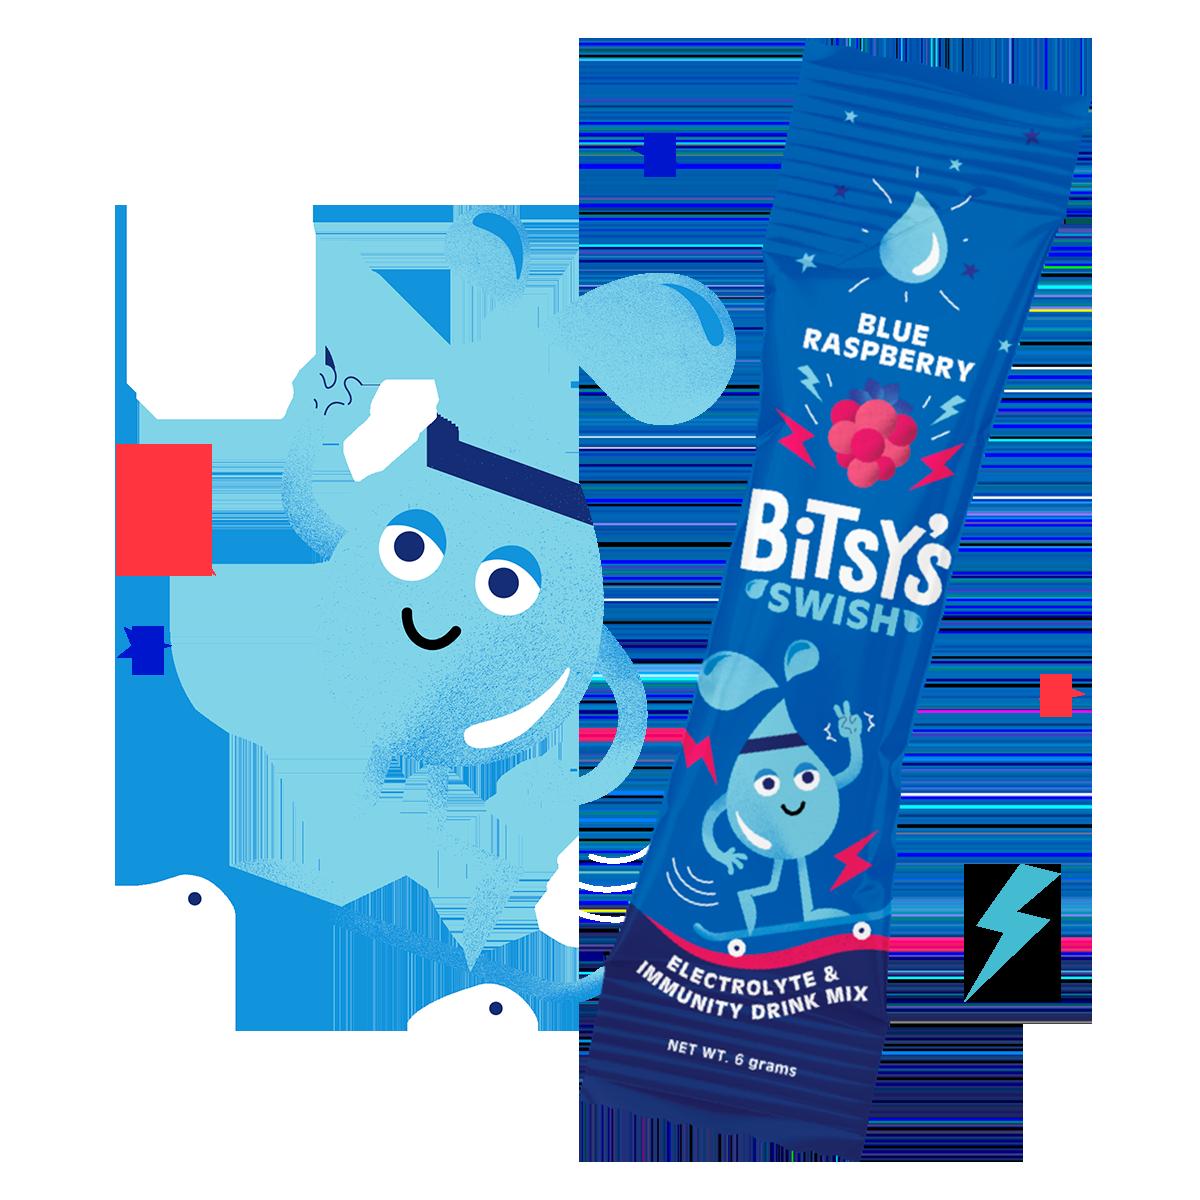 Bitsy's Swish Blue Raspberry